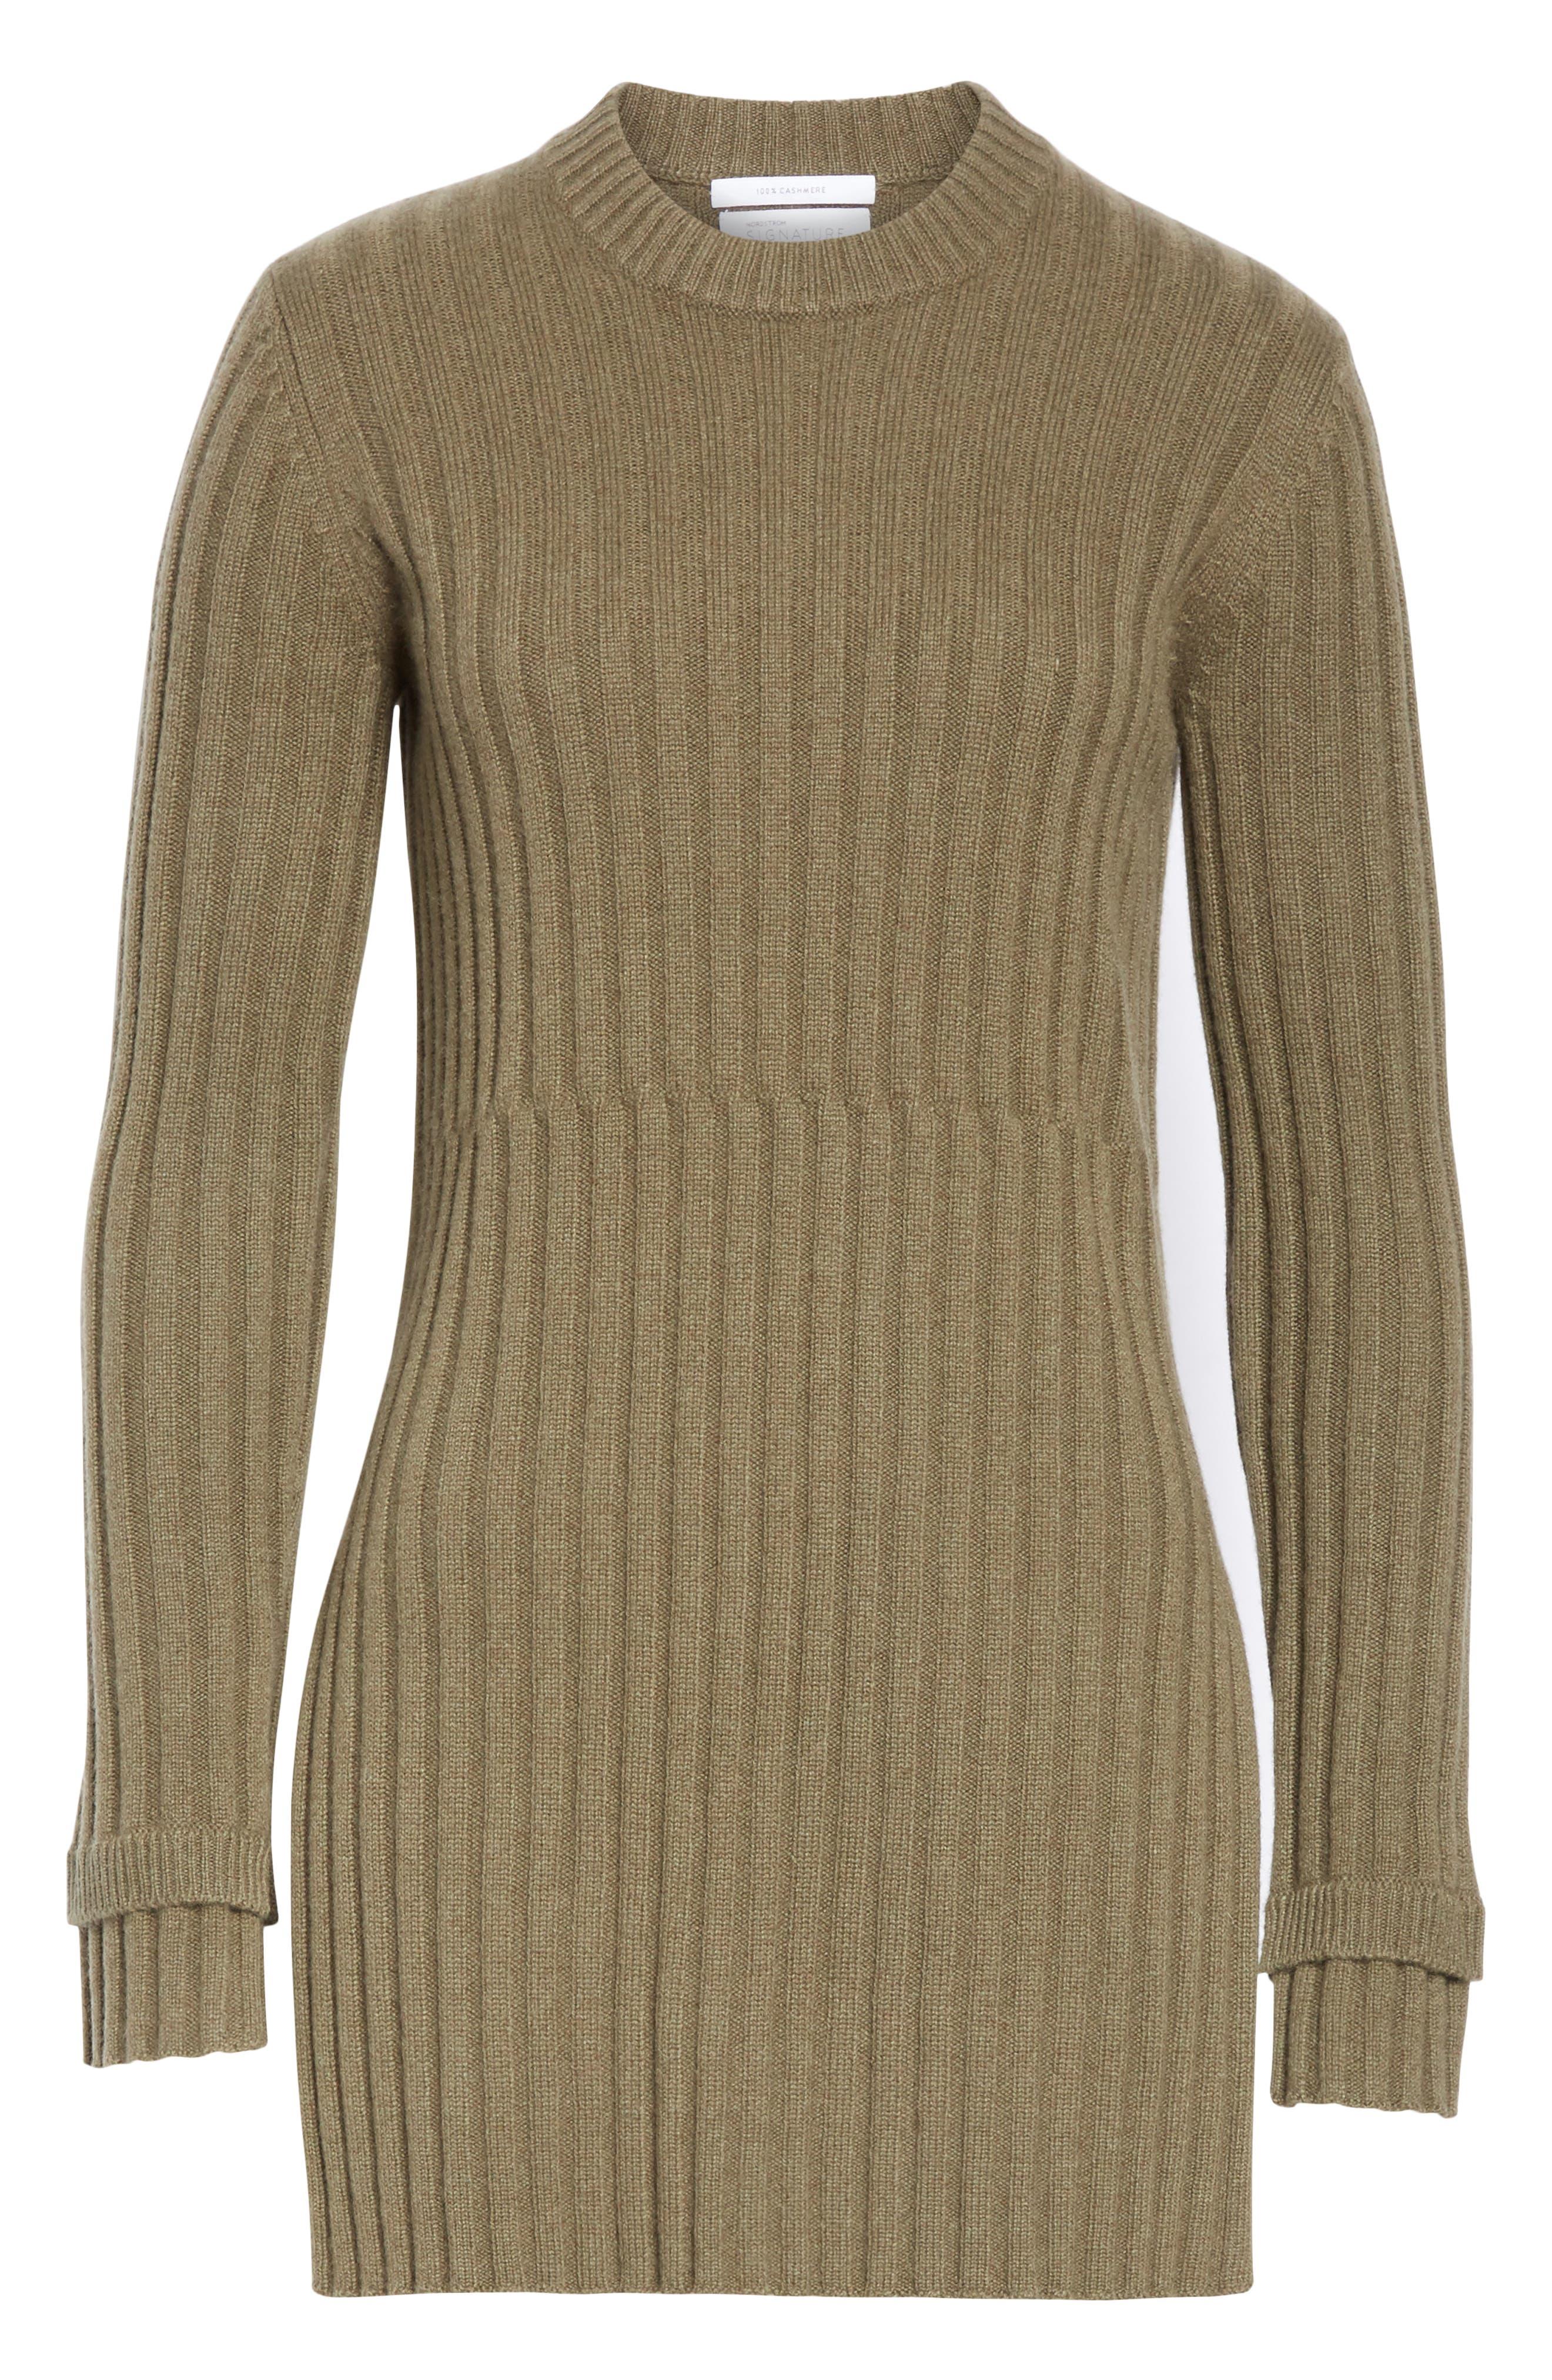 Rib Knit Cashmere Tunic,                             Alternate thumbnail 6, color,                             OLIVE IVY HEATHER